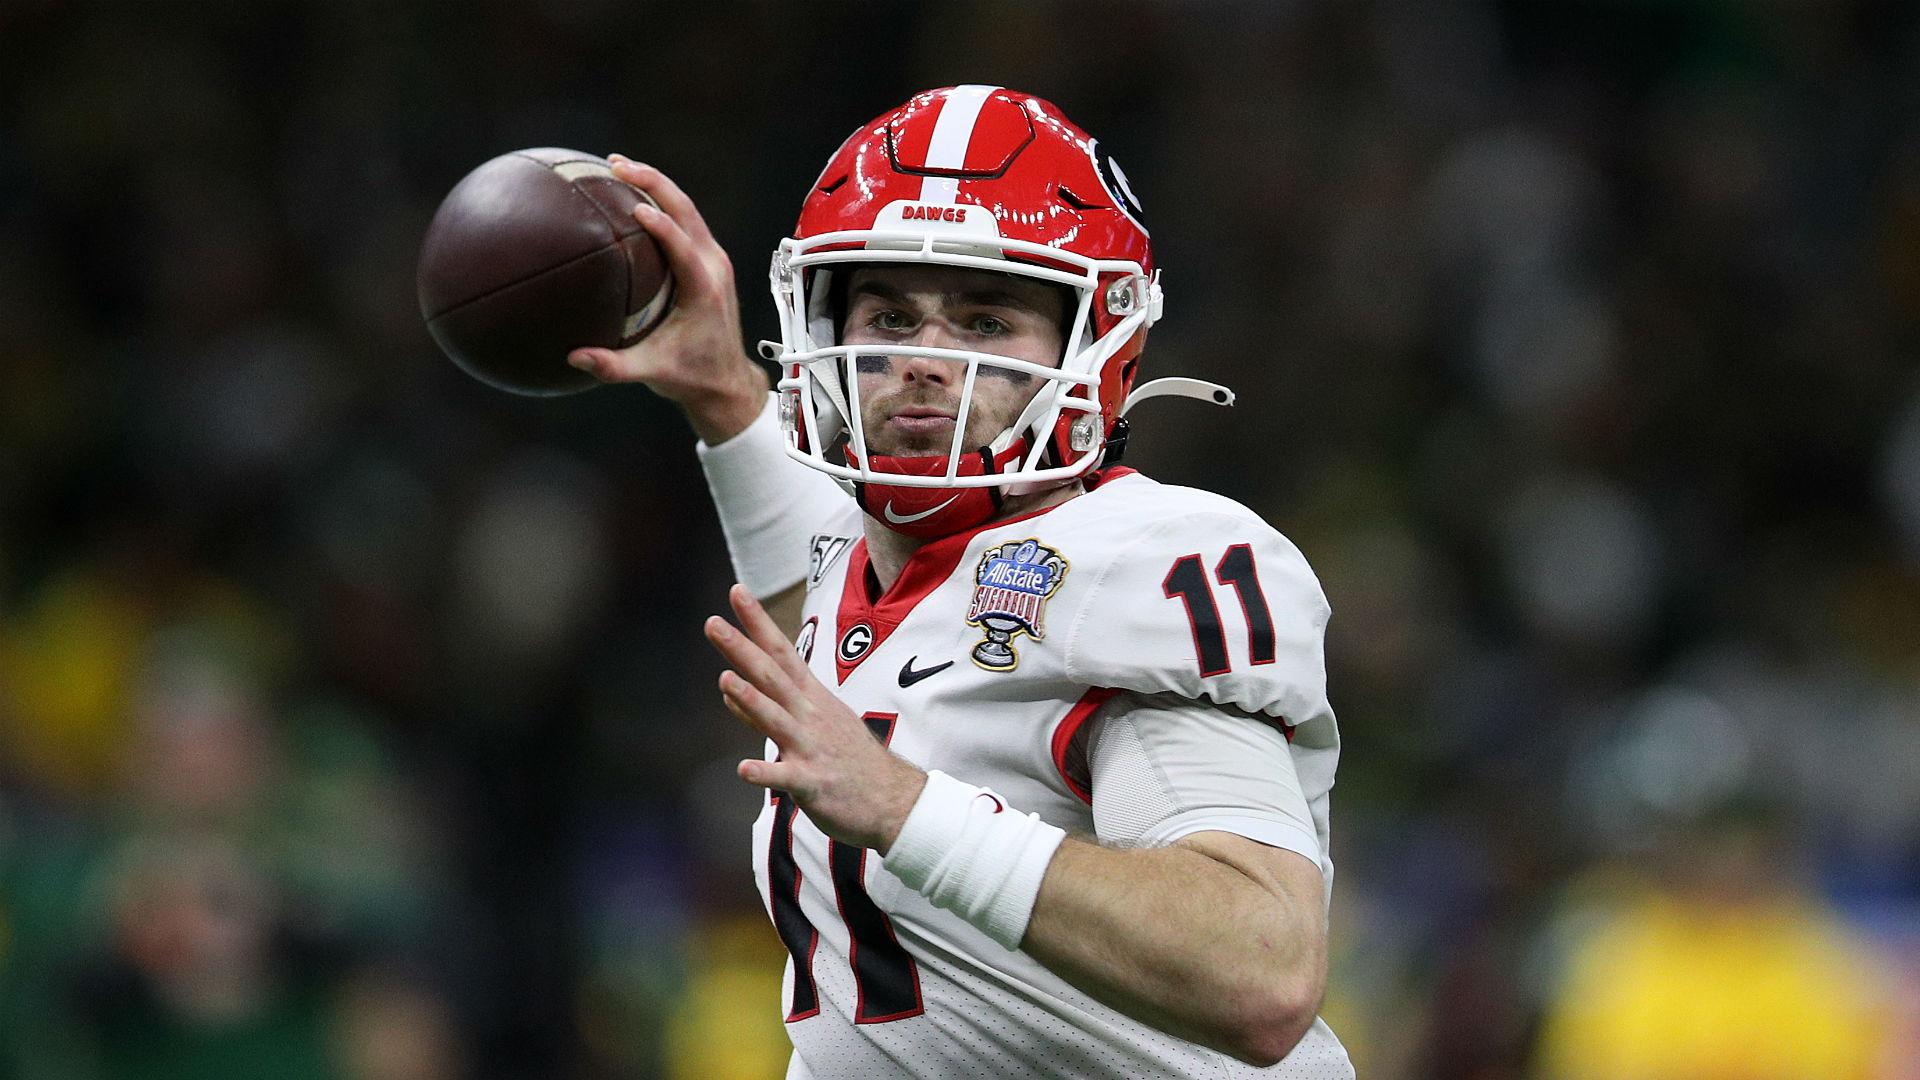 NFL mock draft 2020, Georgia version: Projecting Jake Fromm, De'Andre Swift & other Bulldogs picks